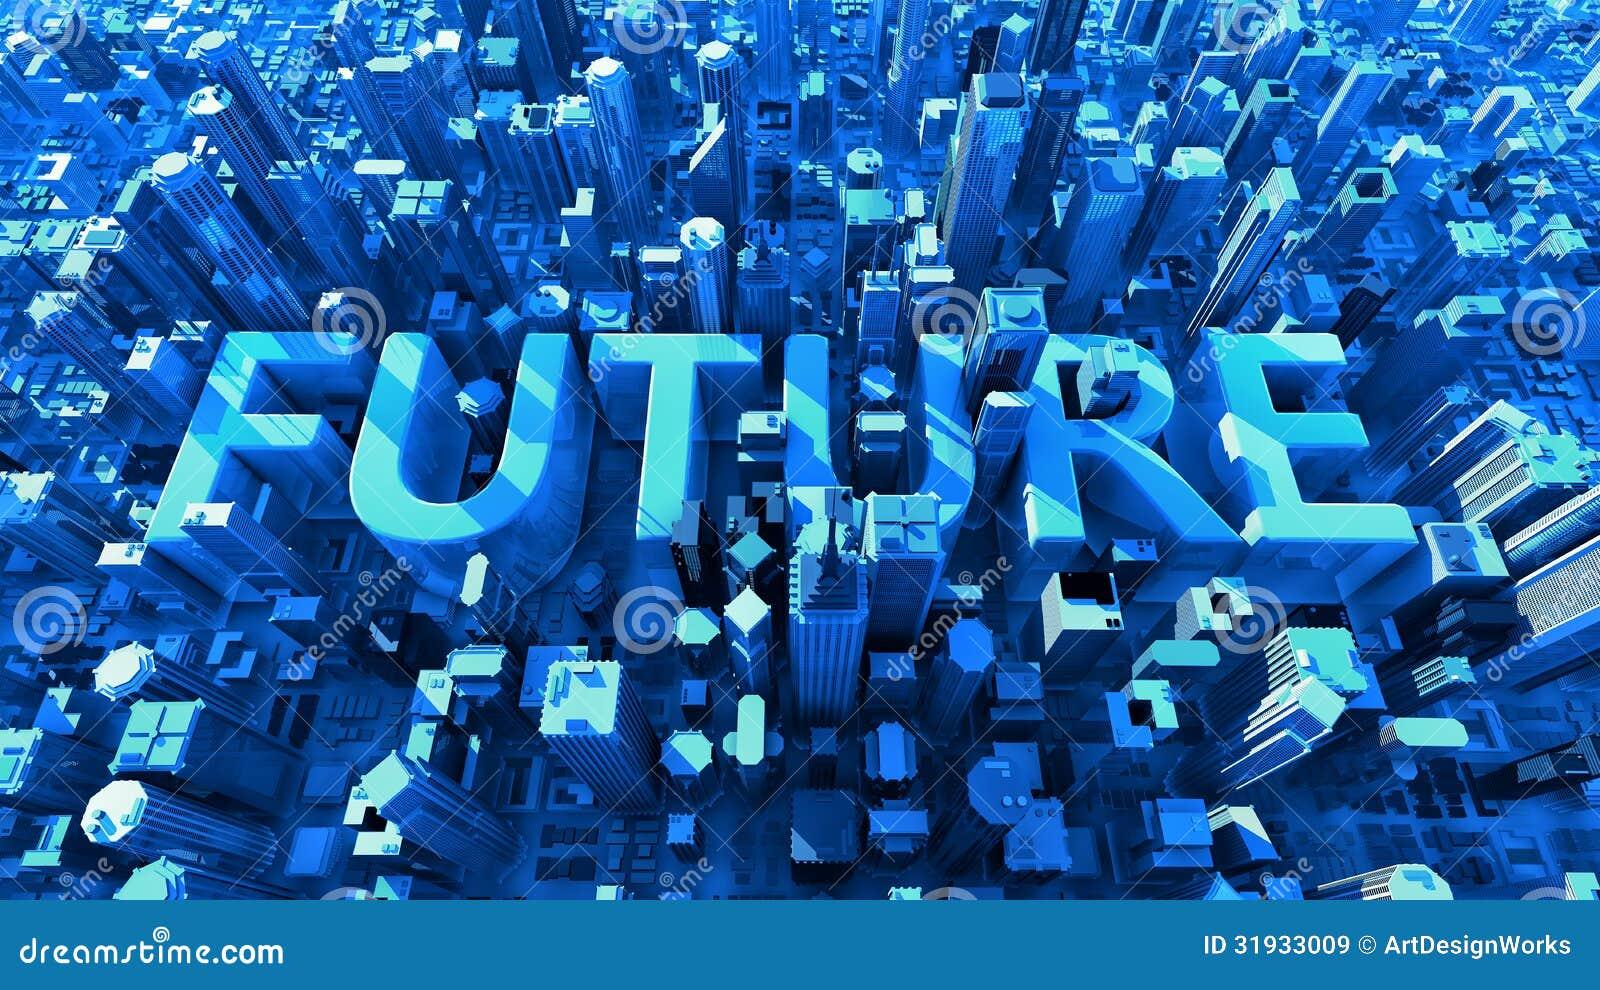 FUTURE of city